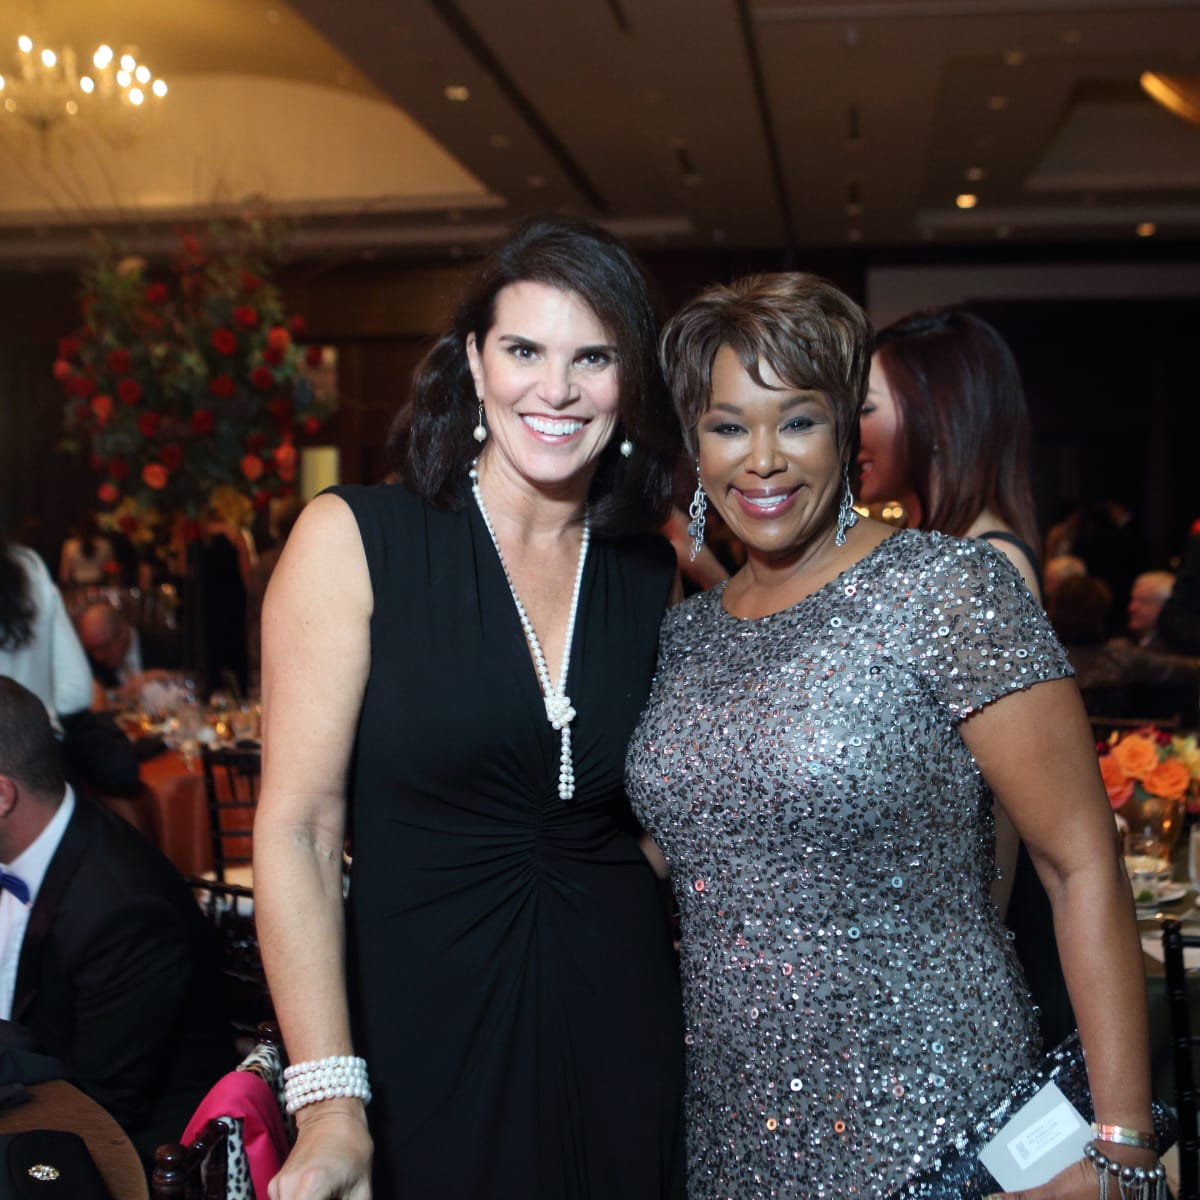 News, Shelby, Women's Home gala, Nov. 2015, Lisa Maloskey, Deborah Duncan